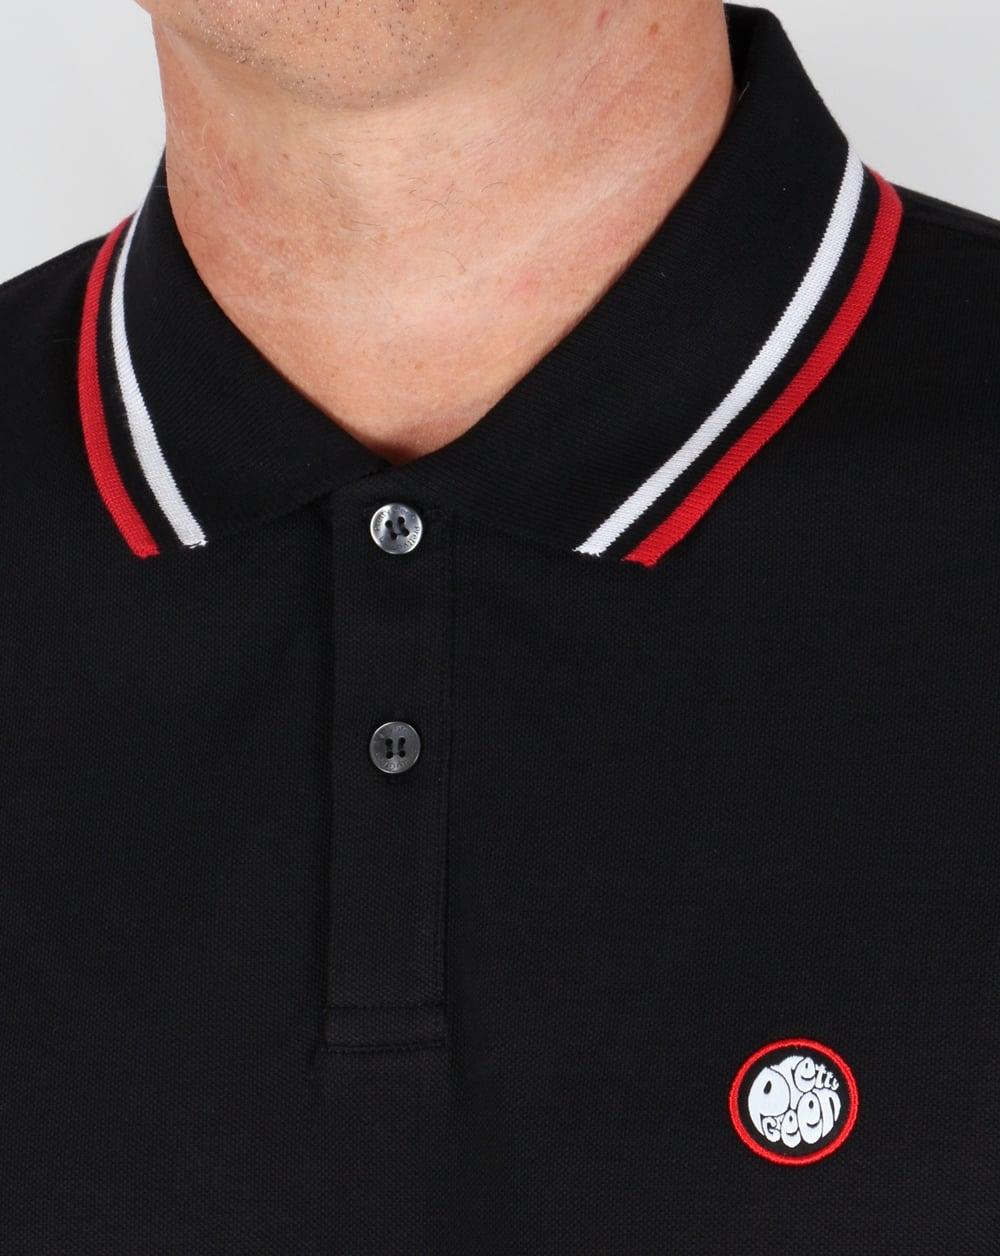 Black t shirt red collar - Black T Shirt Red Collar 48